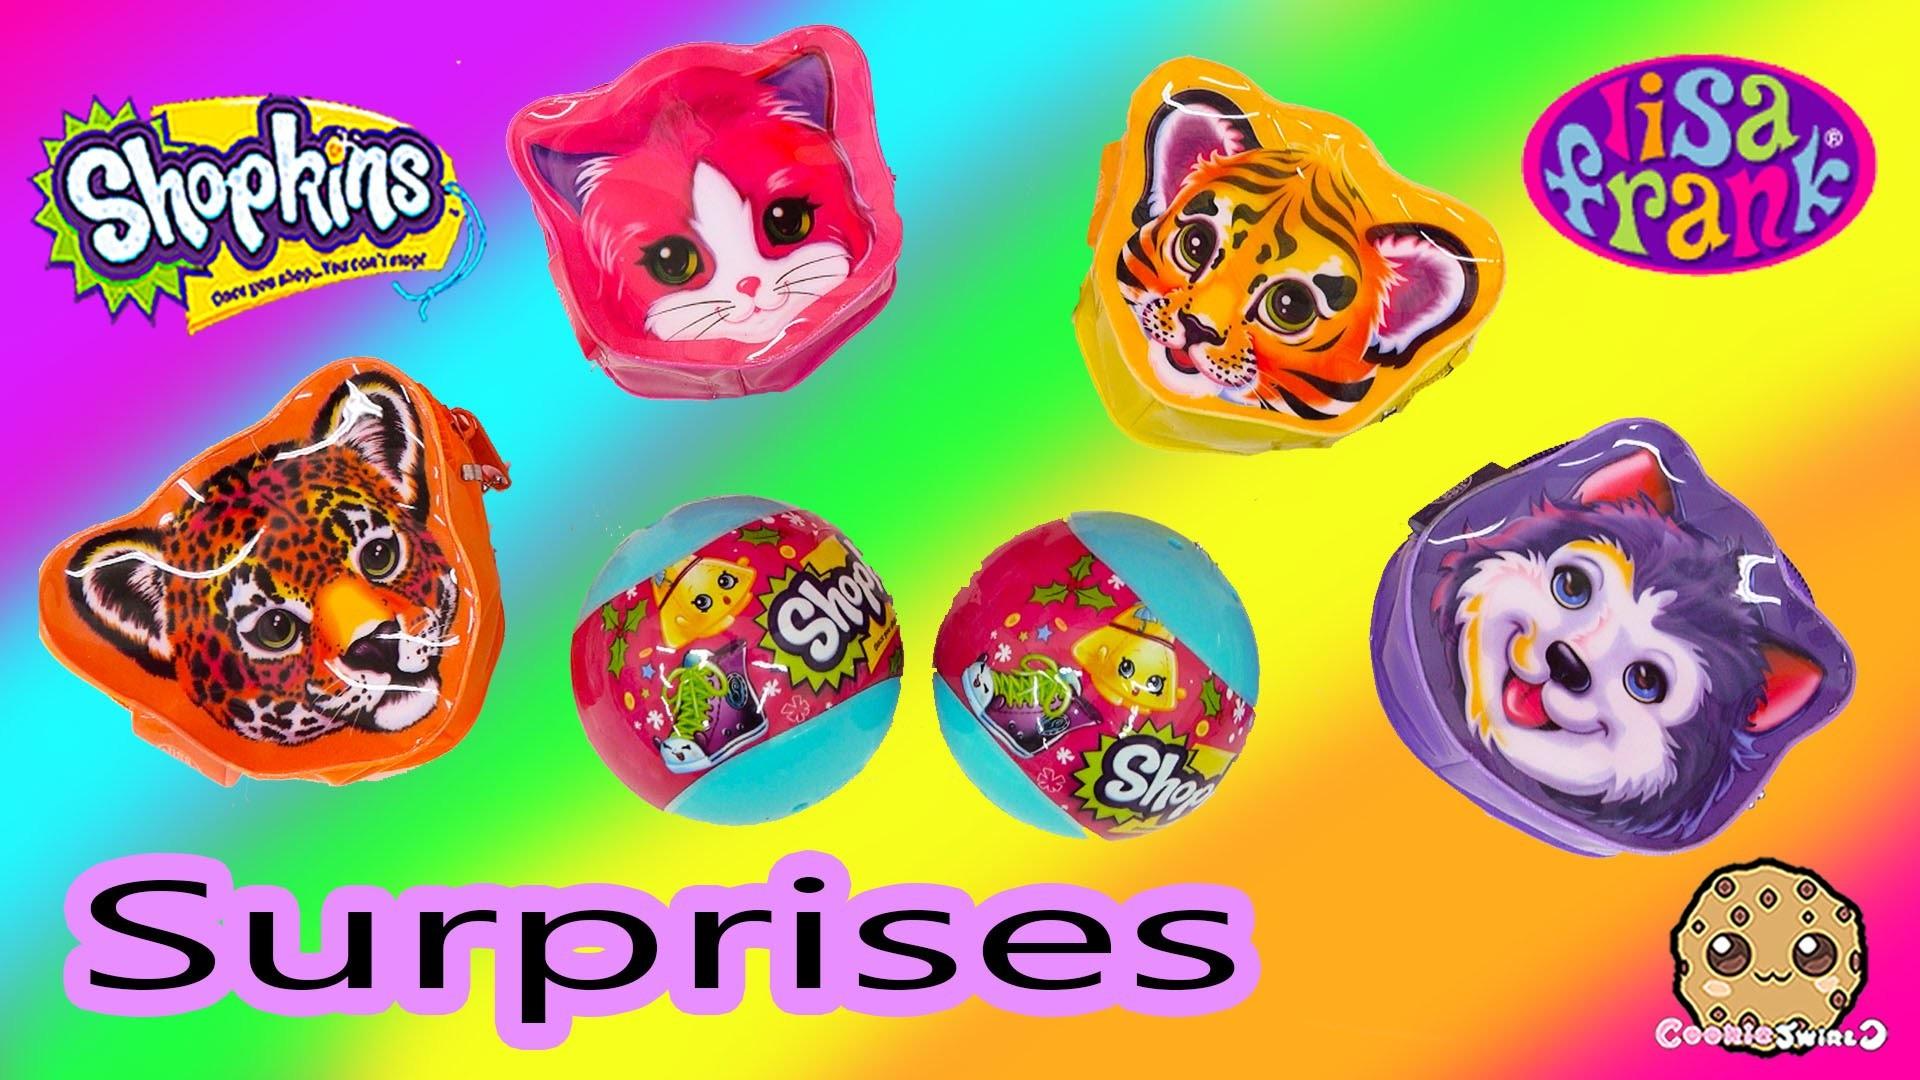 4 Lisa Frank Surprise Mini Bags + 2 Shopkins Season 3 Christmas Ornament  Blind Bag Balls – YouTube